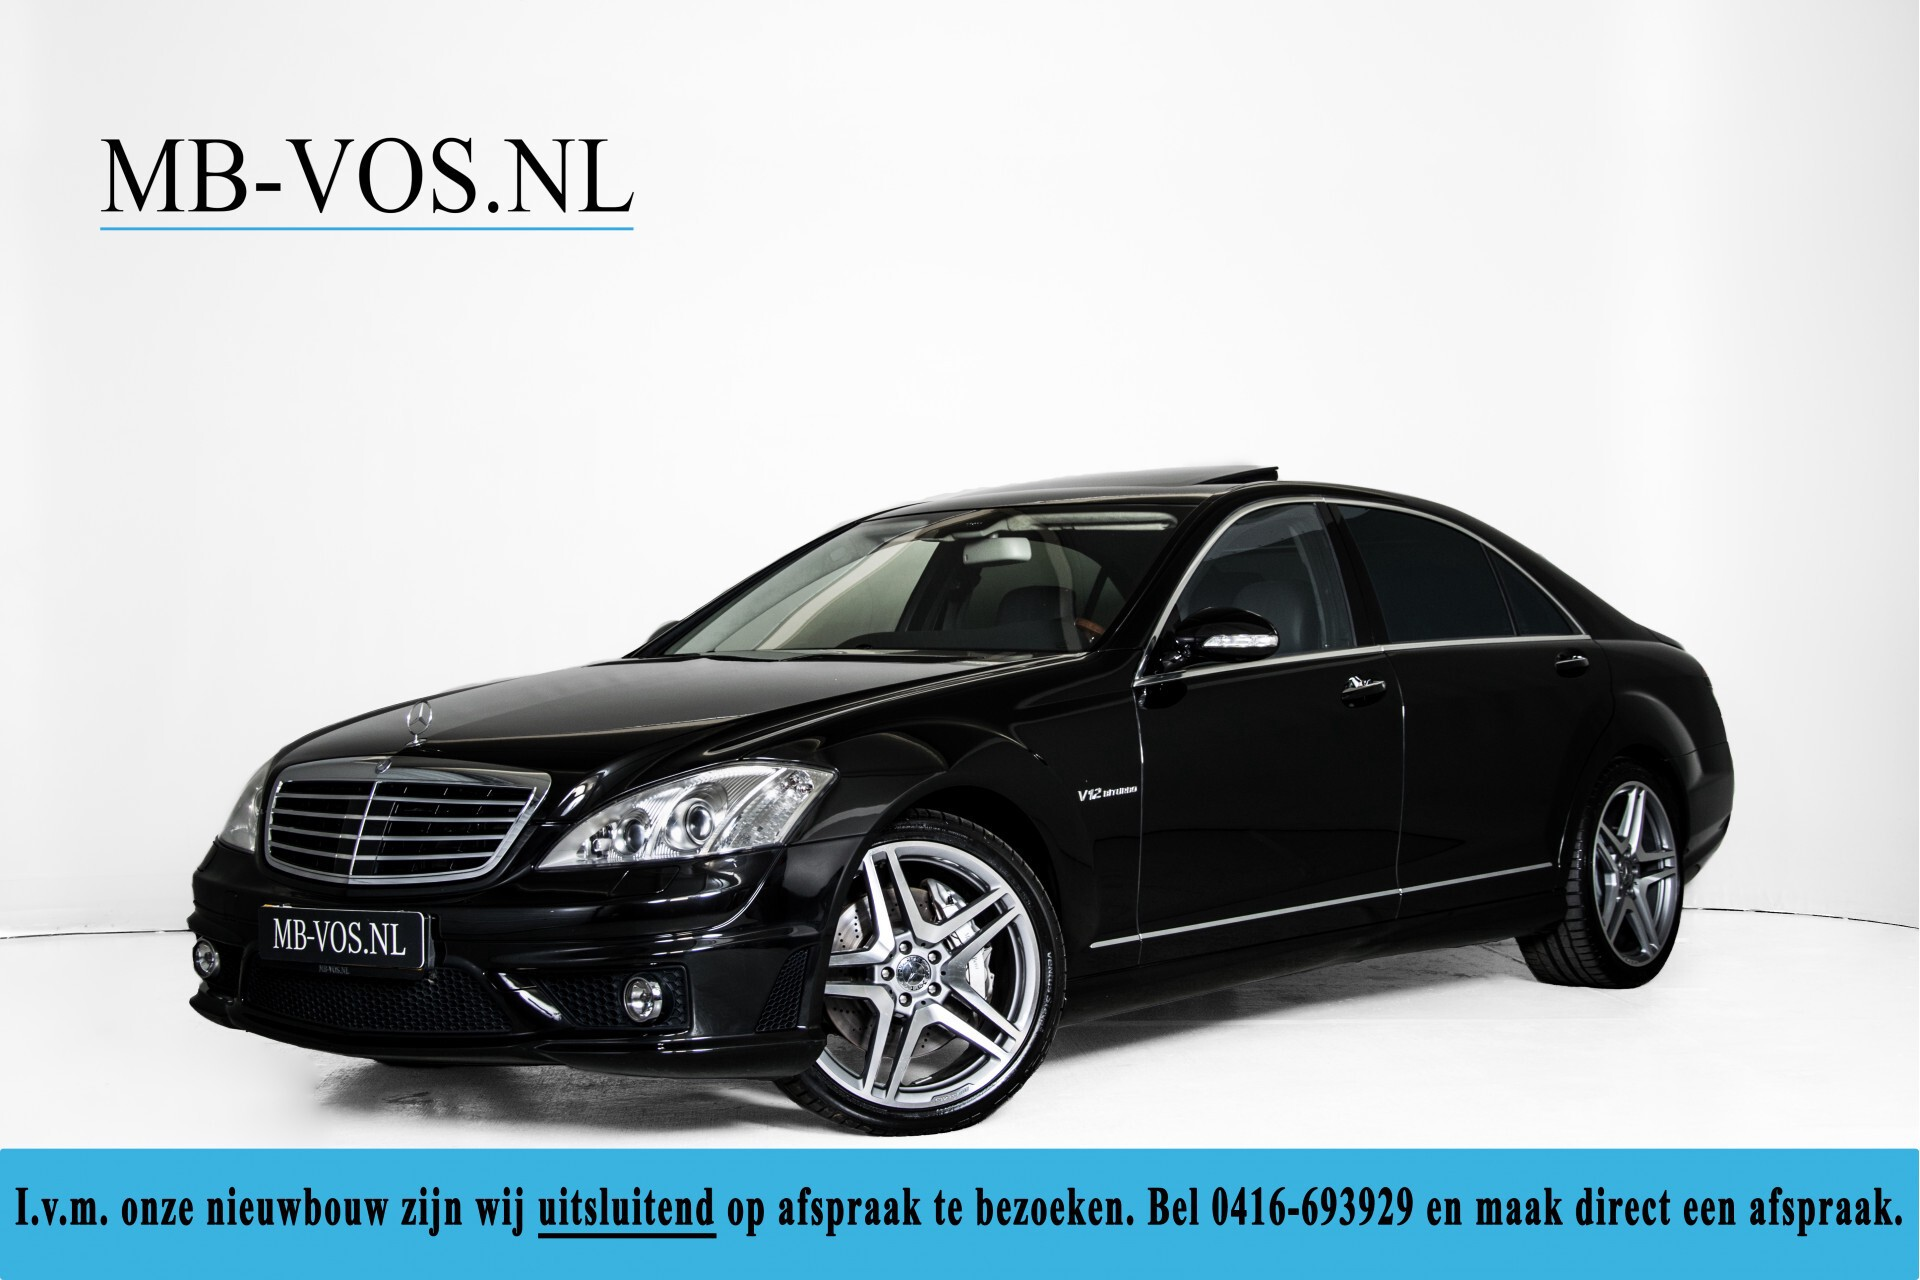 Mercedes-Benz S-Klasse 600 Lang 65 AMG Bi-Turbo Prestige Plus Aut5 Foto 1